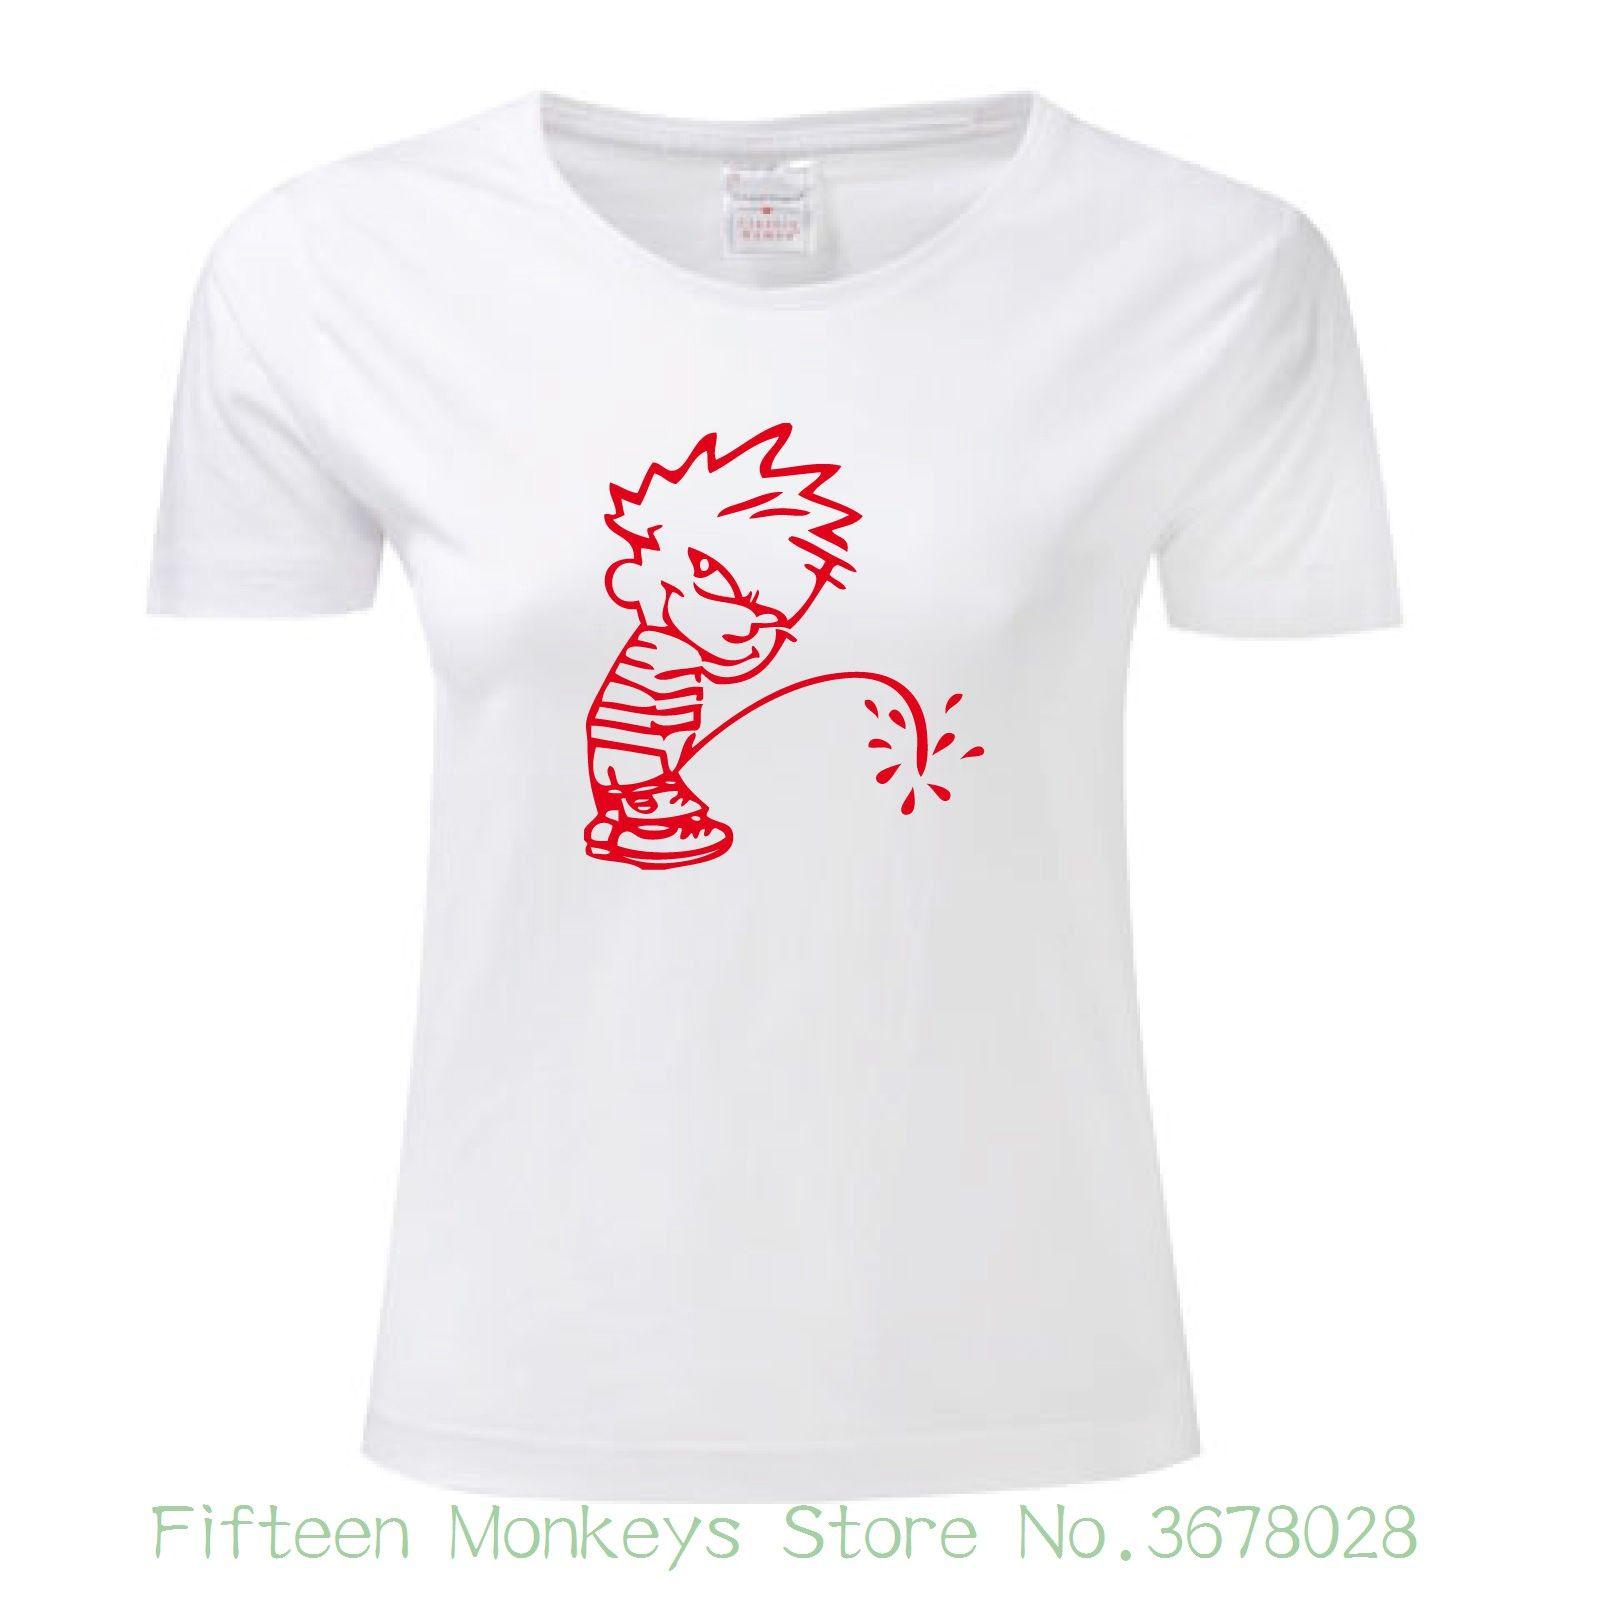 b884baa385 Women s Tee T-shirt Bambino Pipi Wee Wee Maglietta Maglia Uomo Donna Man  Woman Moda Comica Casual Funny Tee Shirt Femme